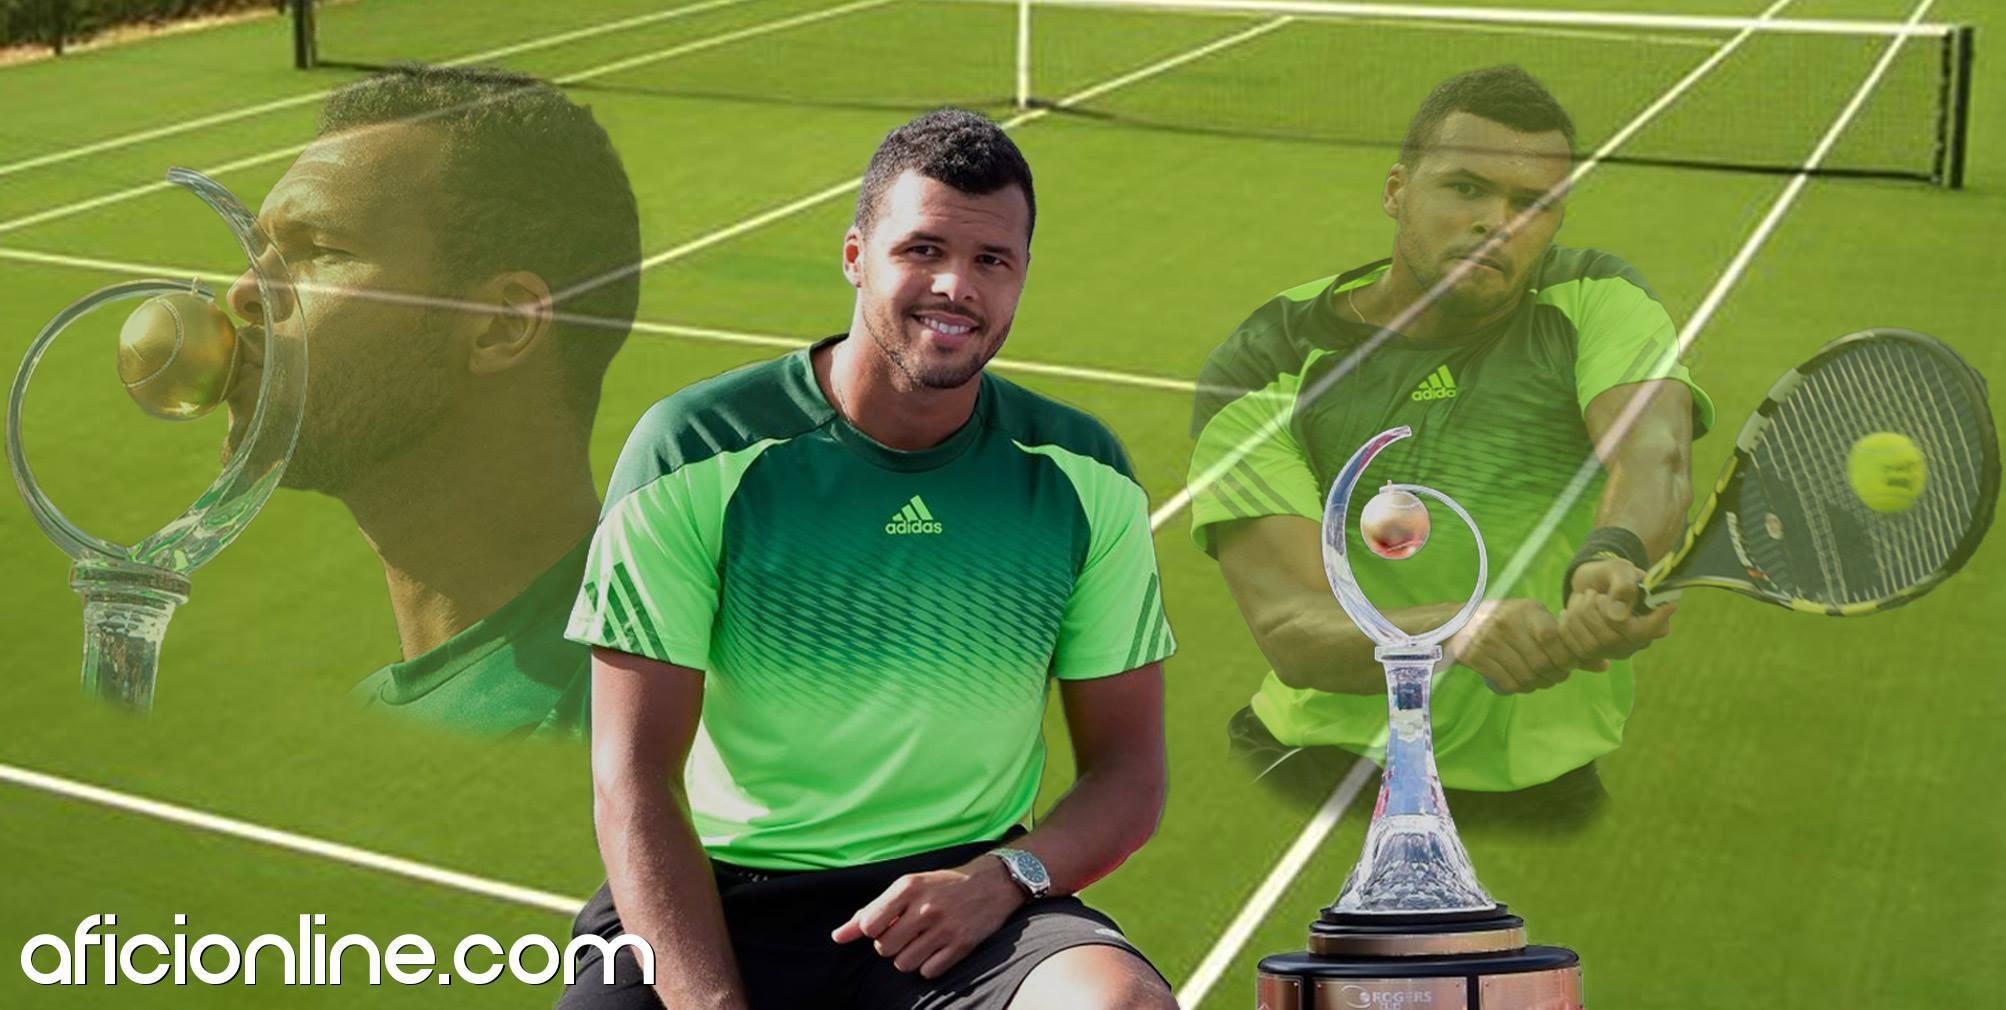 El tenista galo venció en la final a Roger Federer (Gráfica: Johnny López / Aficionline.com).